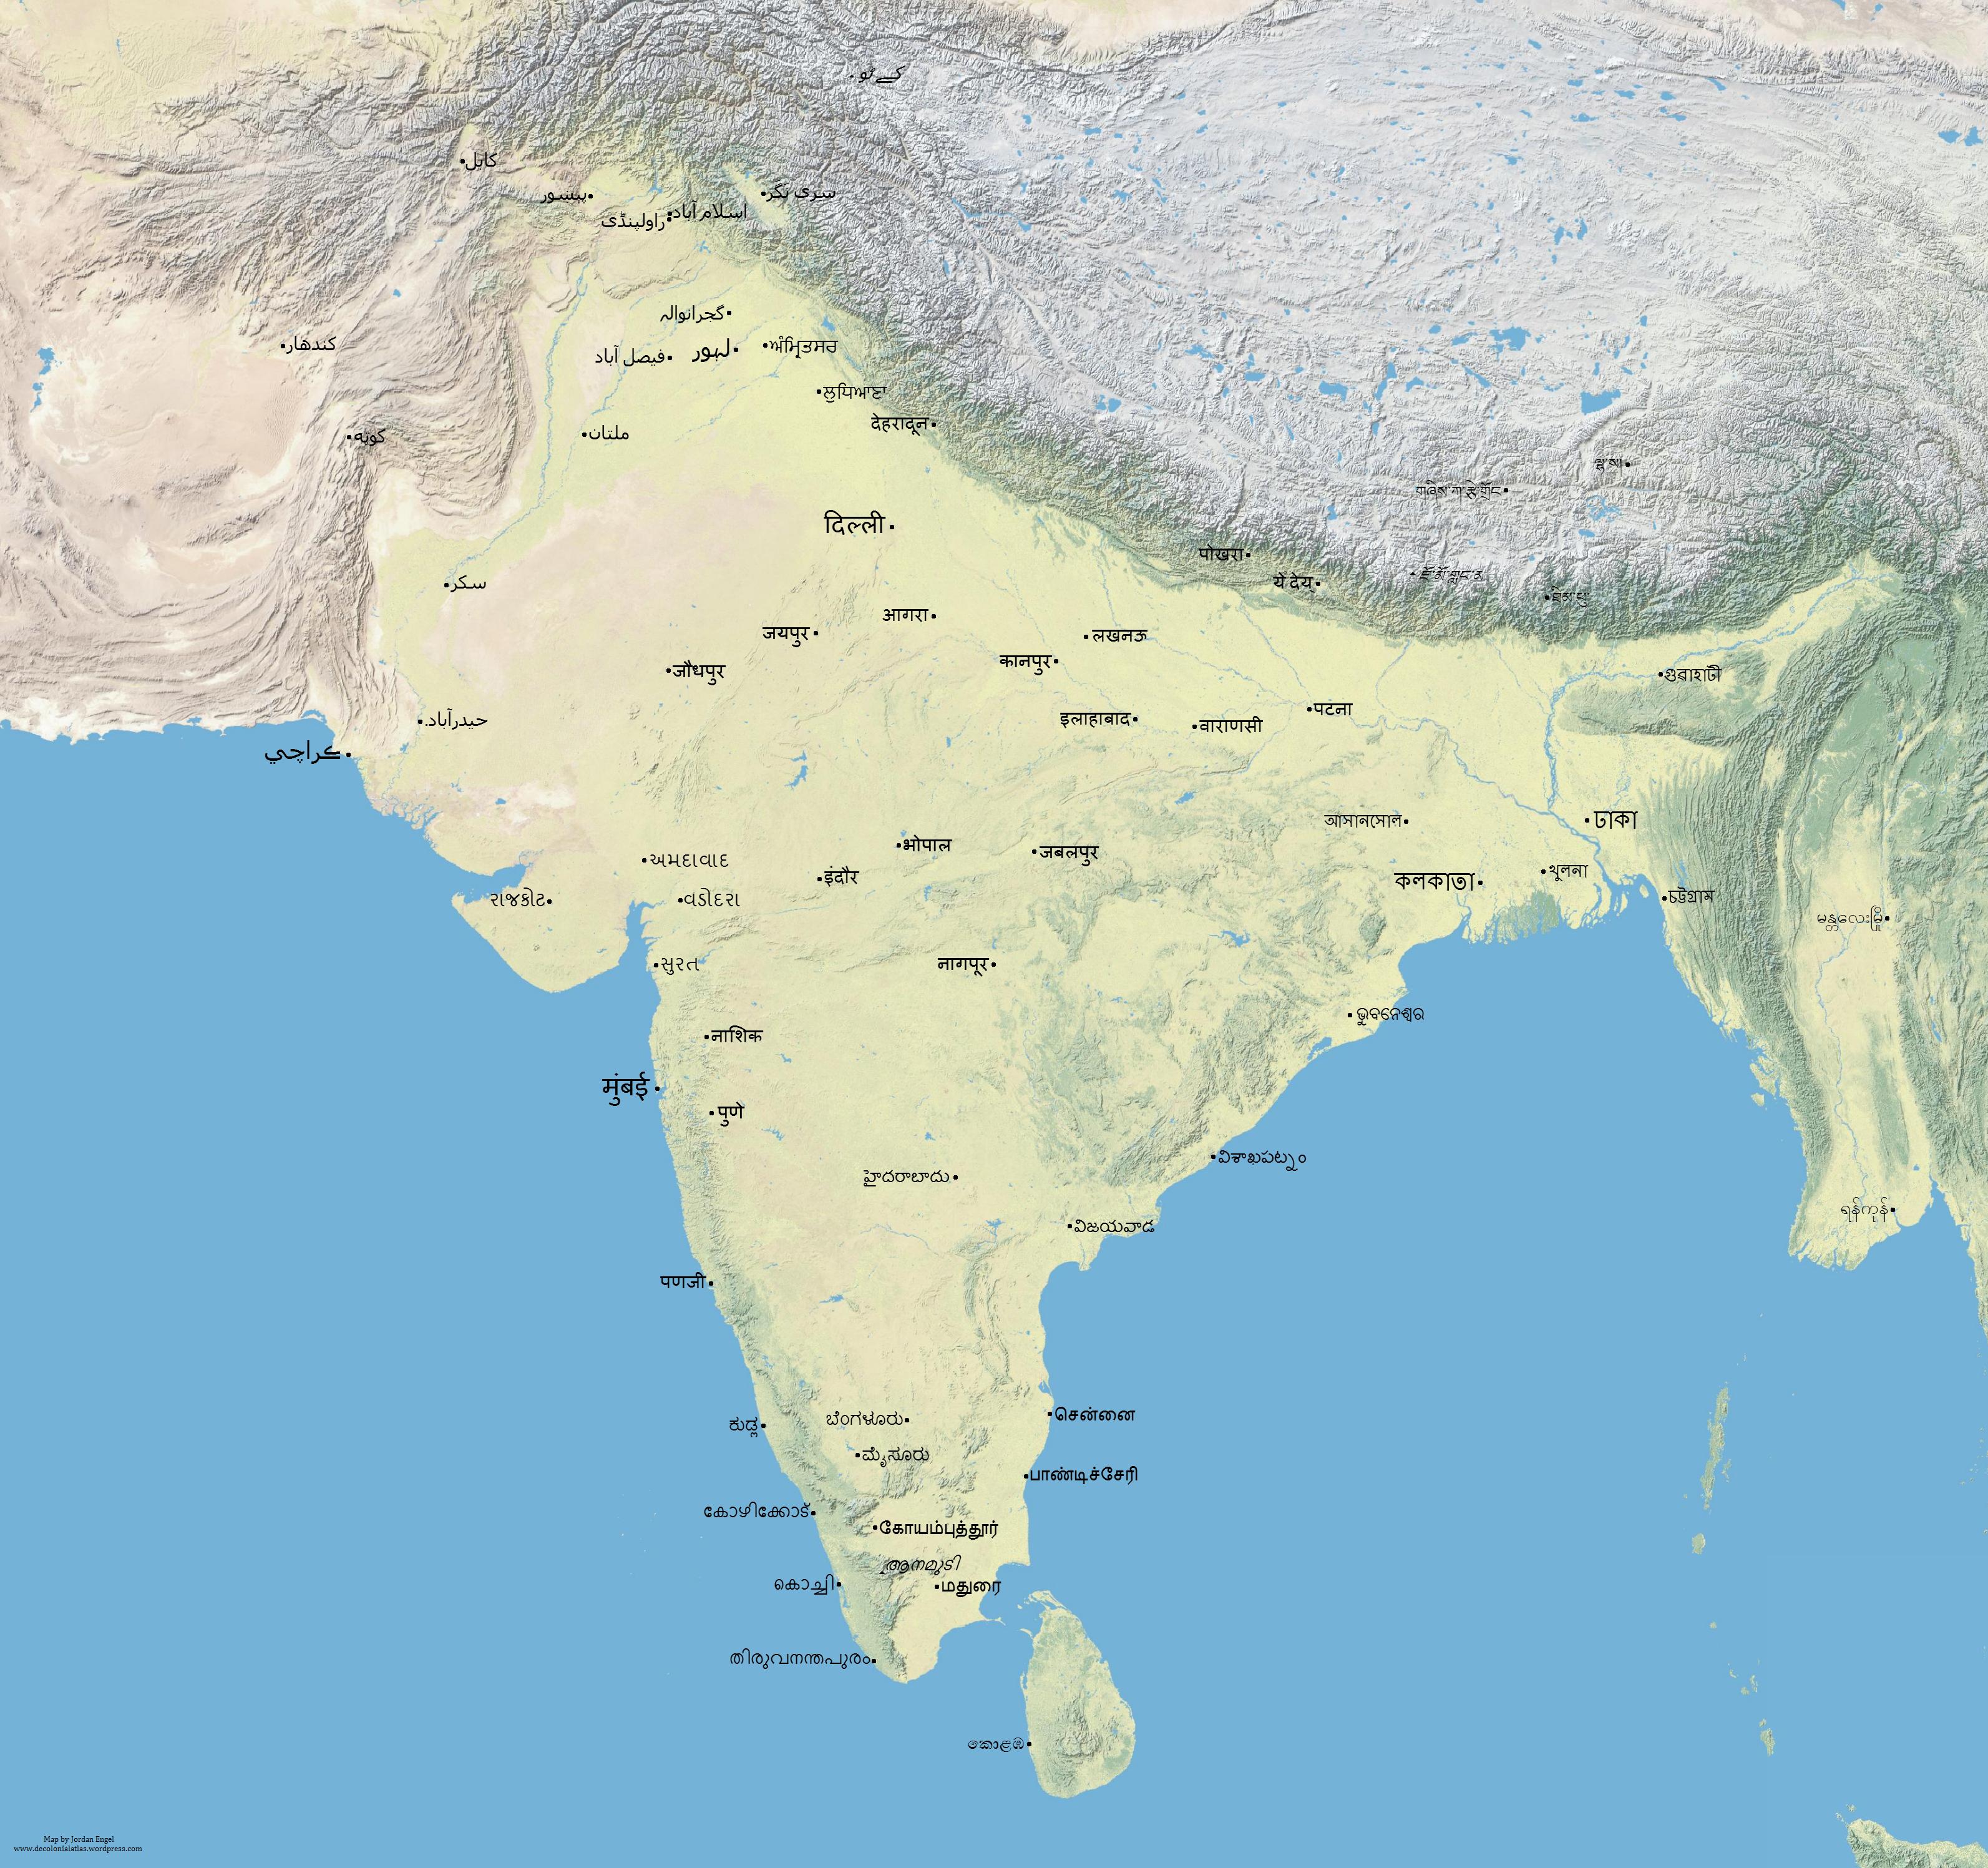 South Asia Decolonized Native Place Names No Borders The - North america map in gujarati